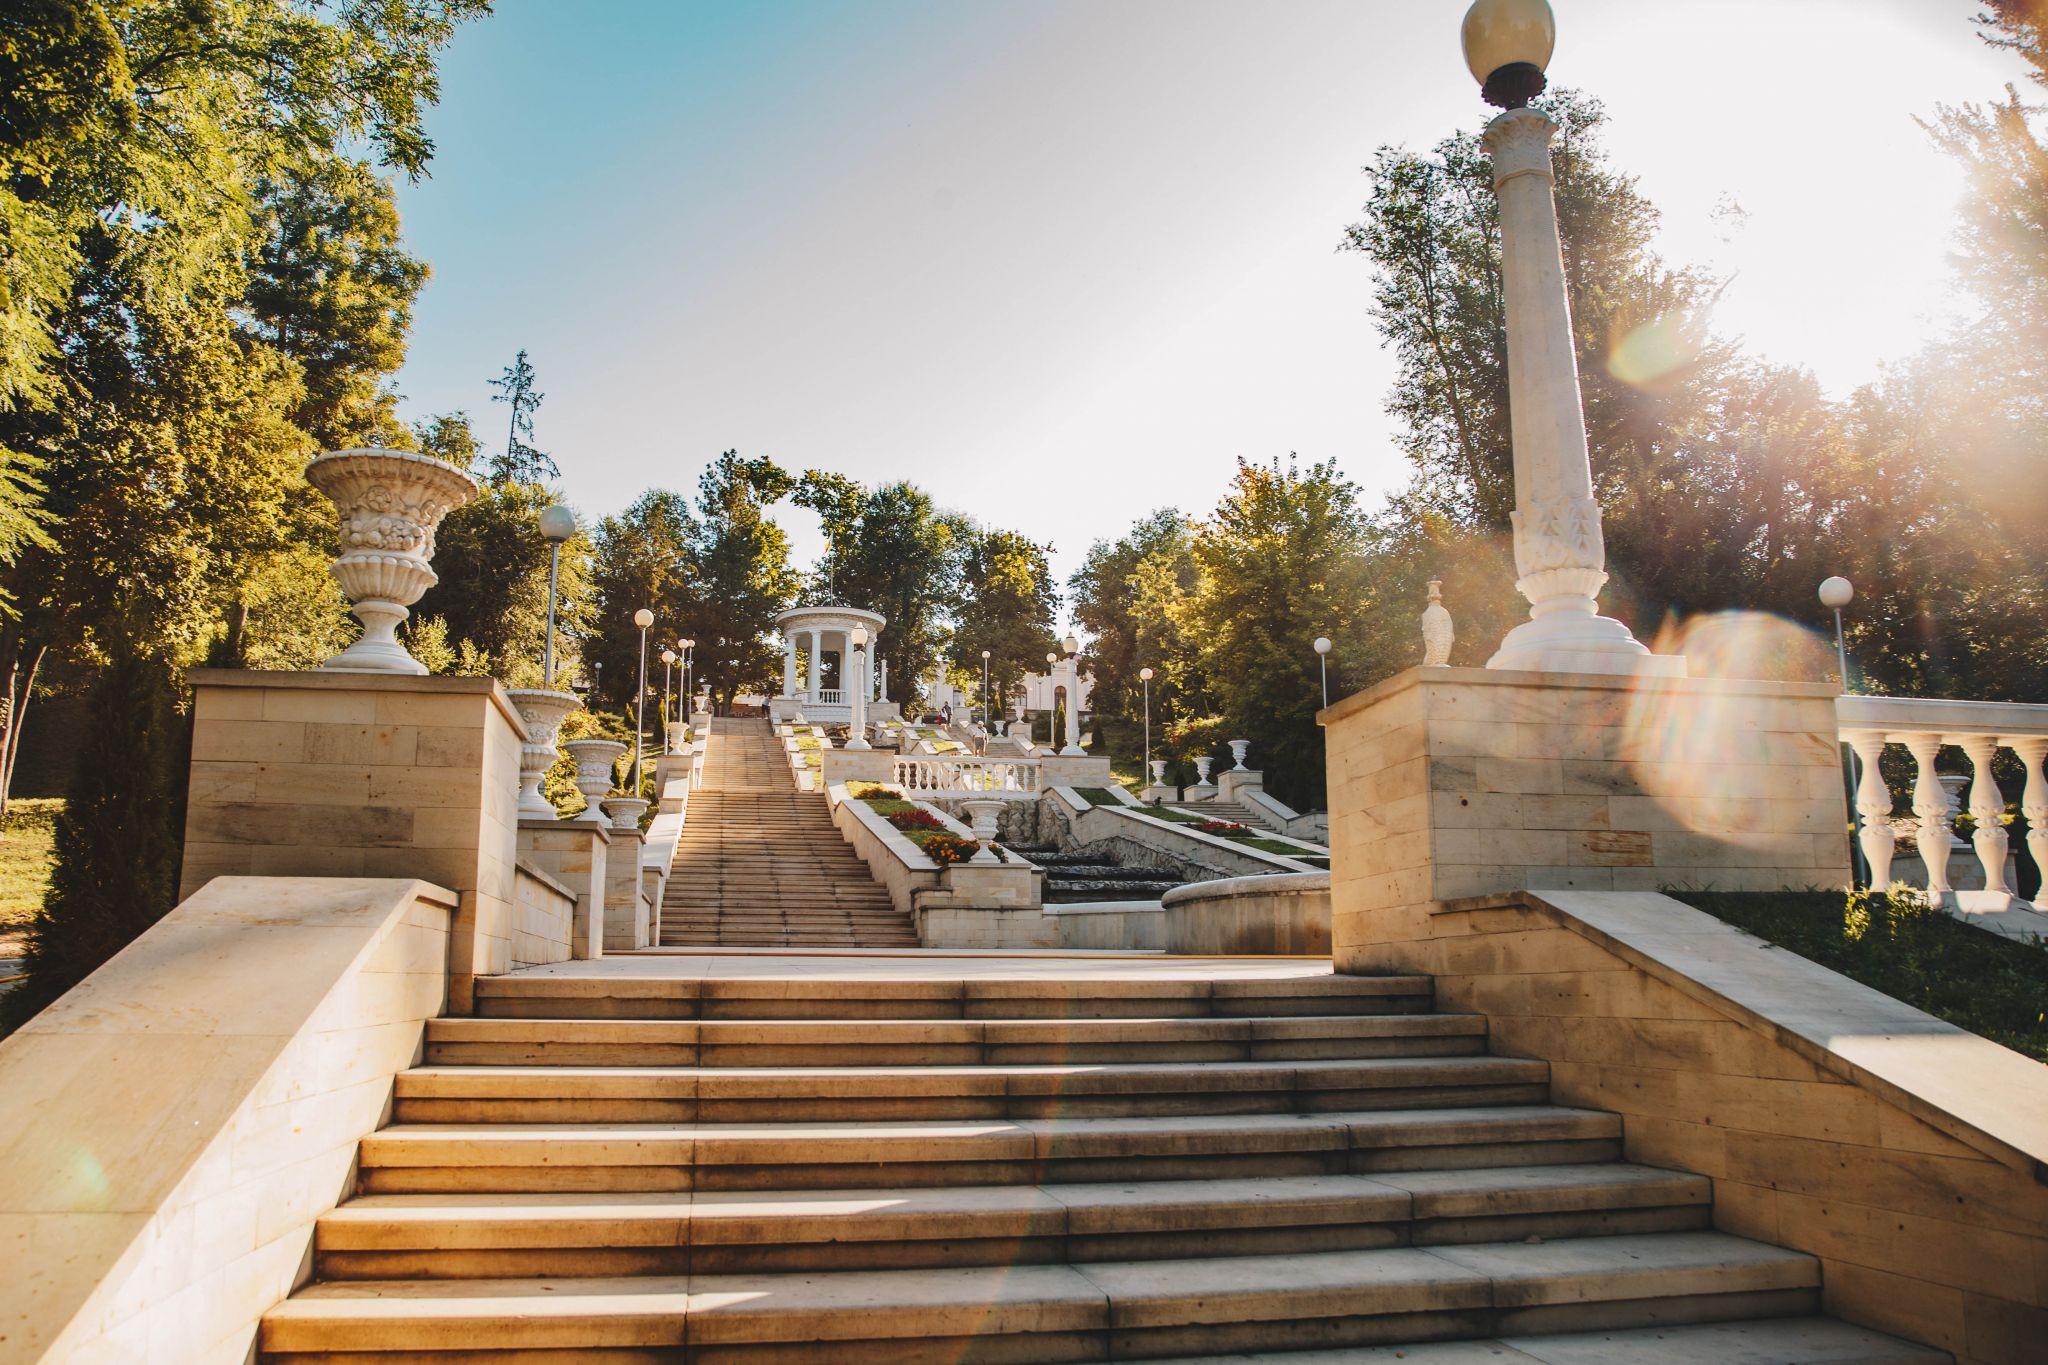 Cascade Steps, Moldova